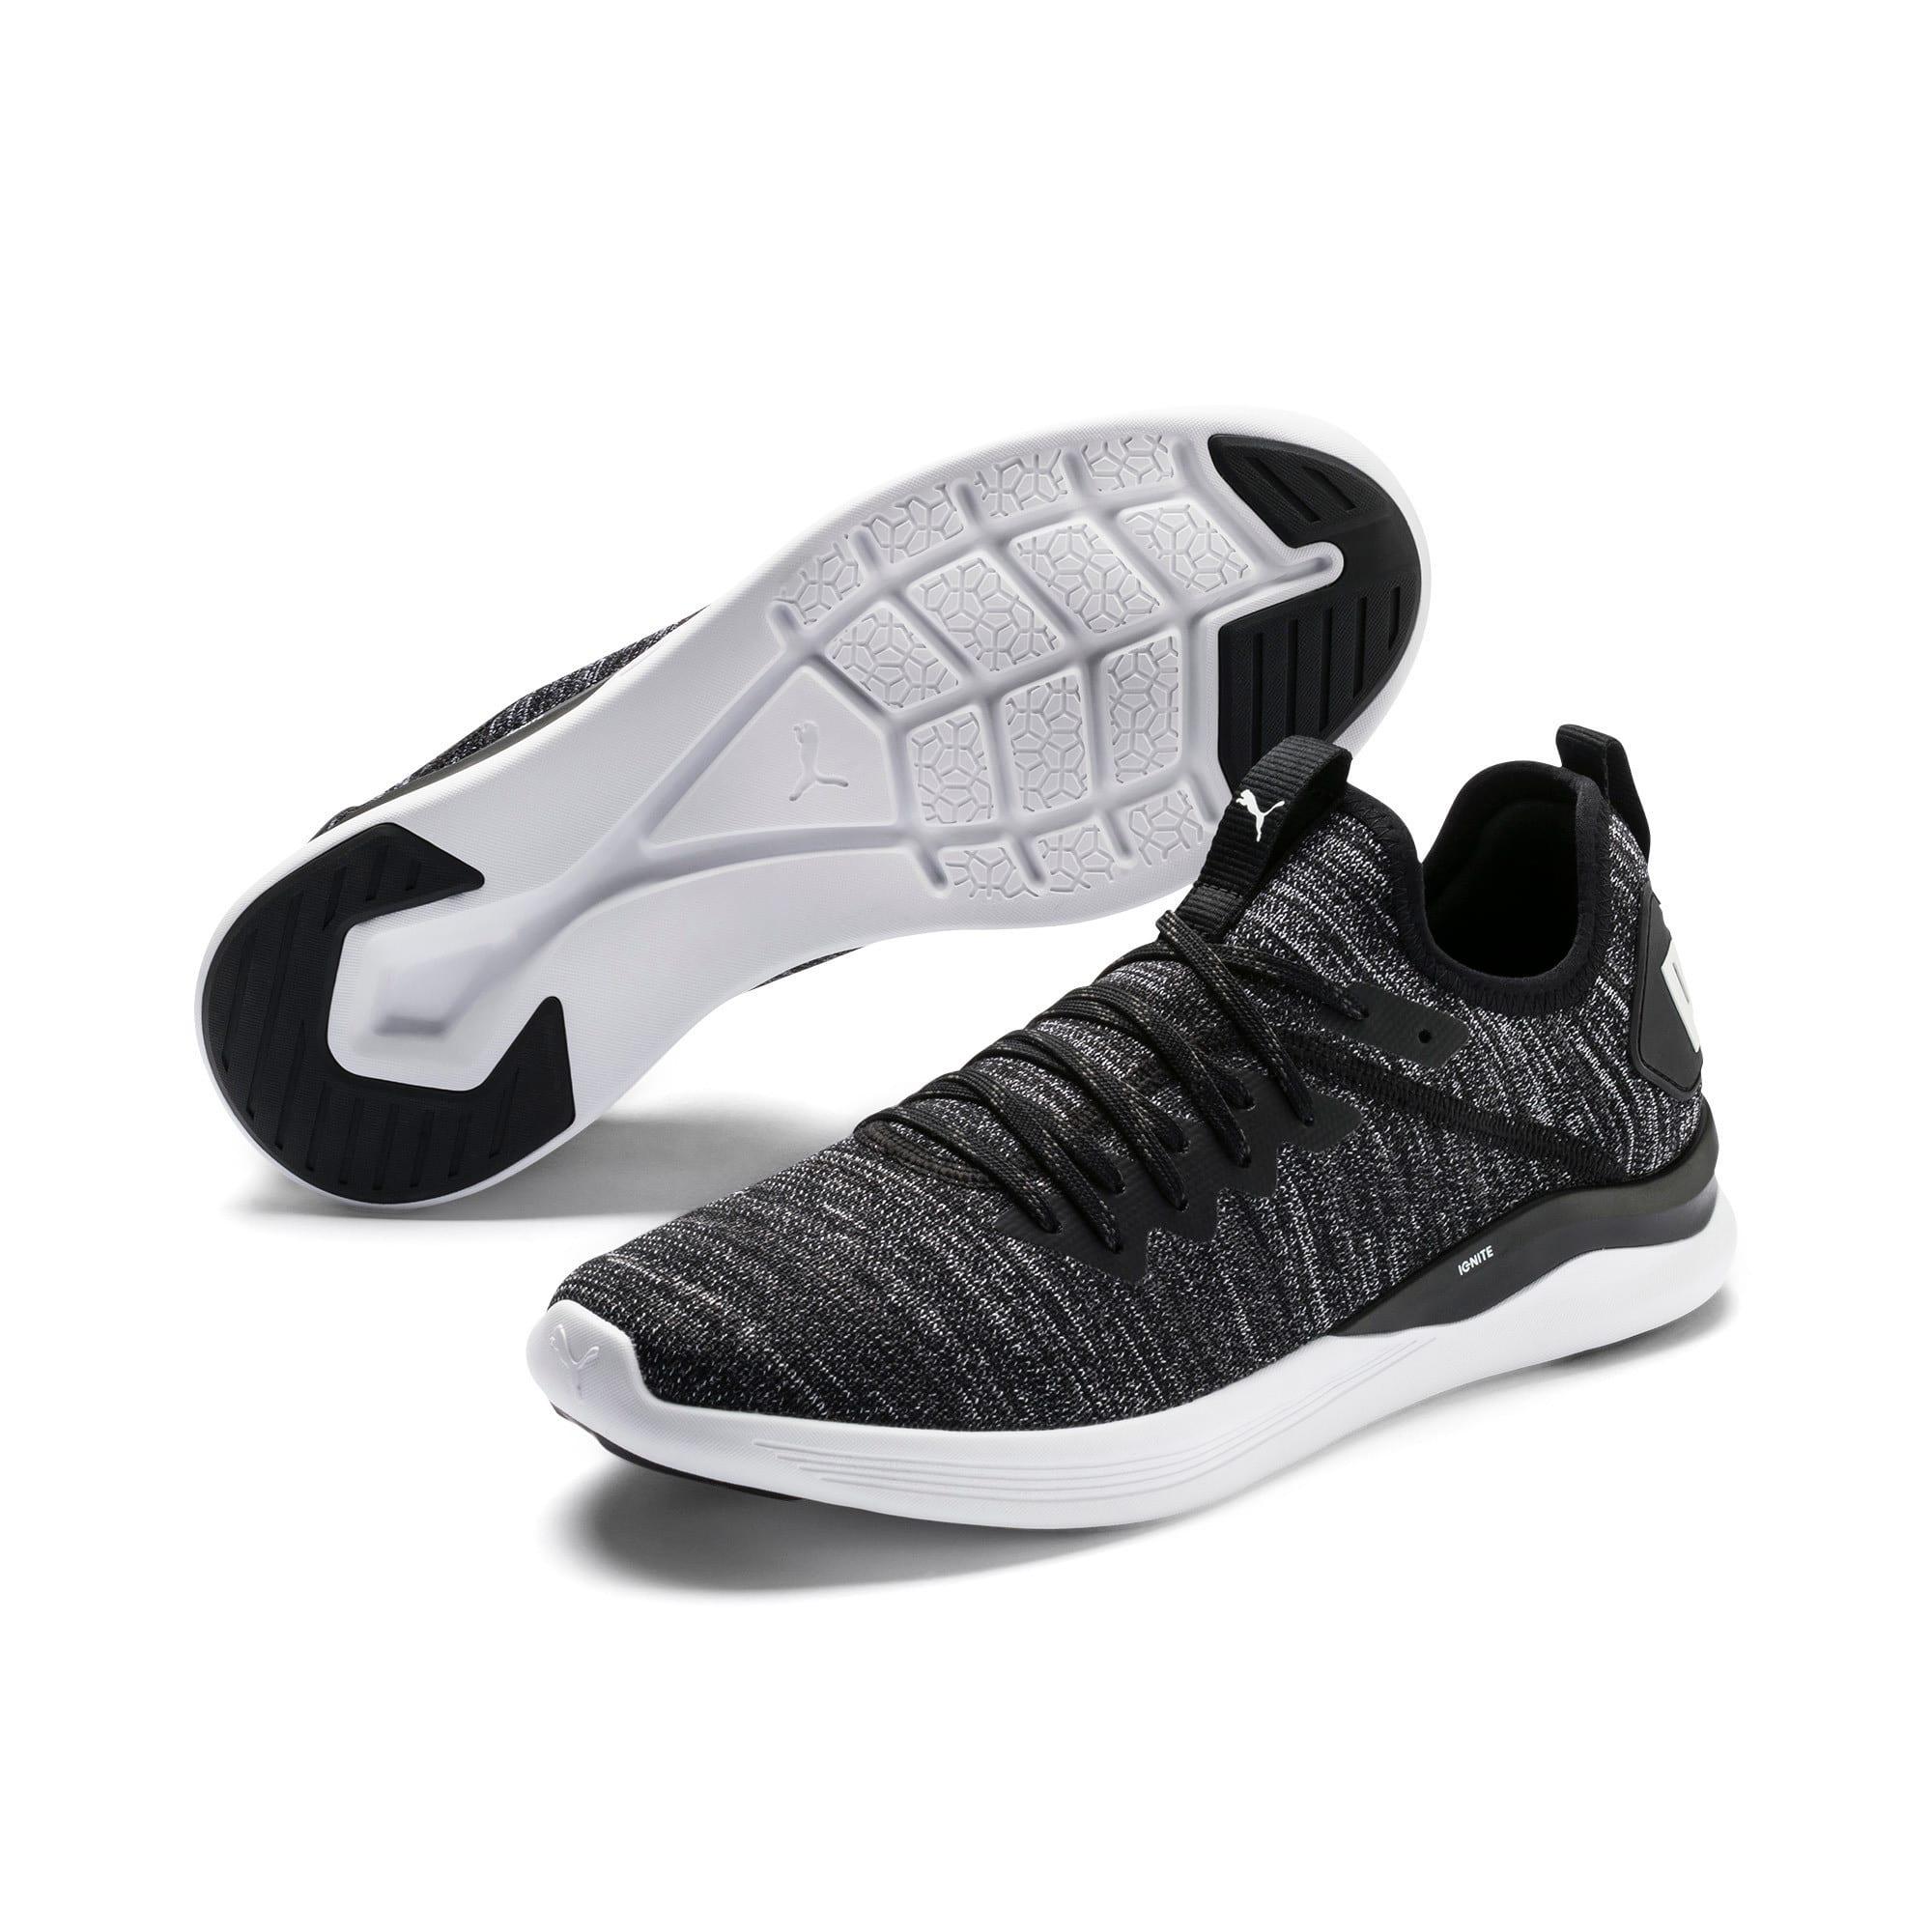 Thumbnail 2 of IGNITE Flash evoKNIT sportschoenen voor heren, Black-Asphalt-White, medium